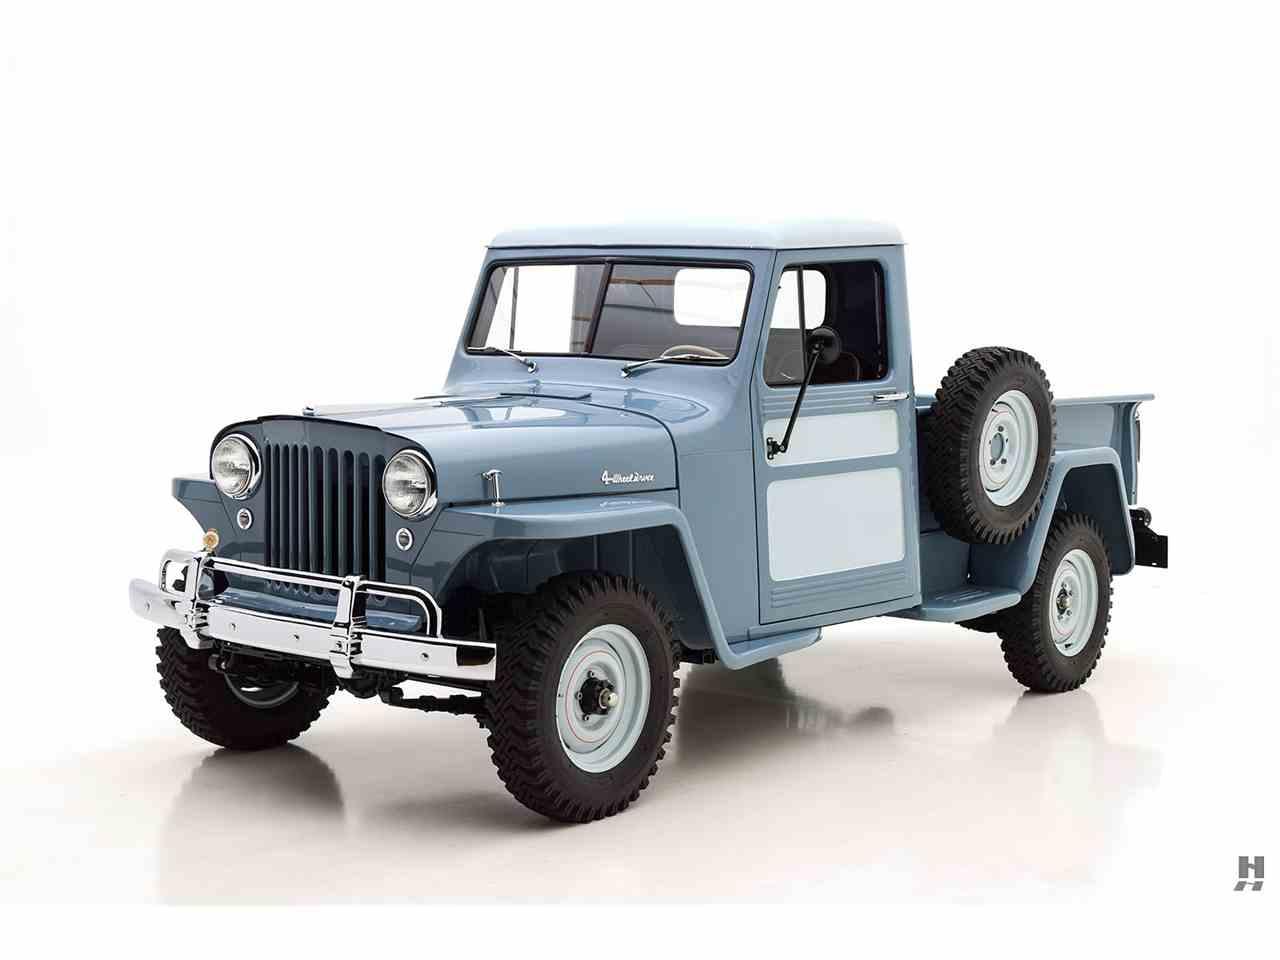 1948 willys overland jeep for sale cc 1027061. Black Bedroom Furniture Sets. Home Design Ideas